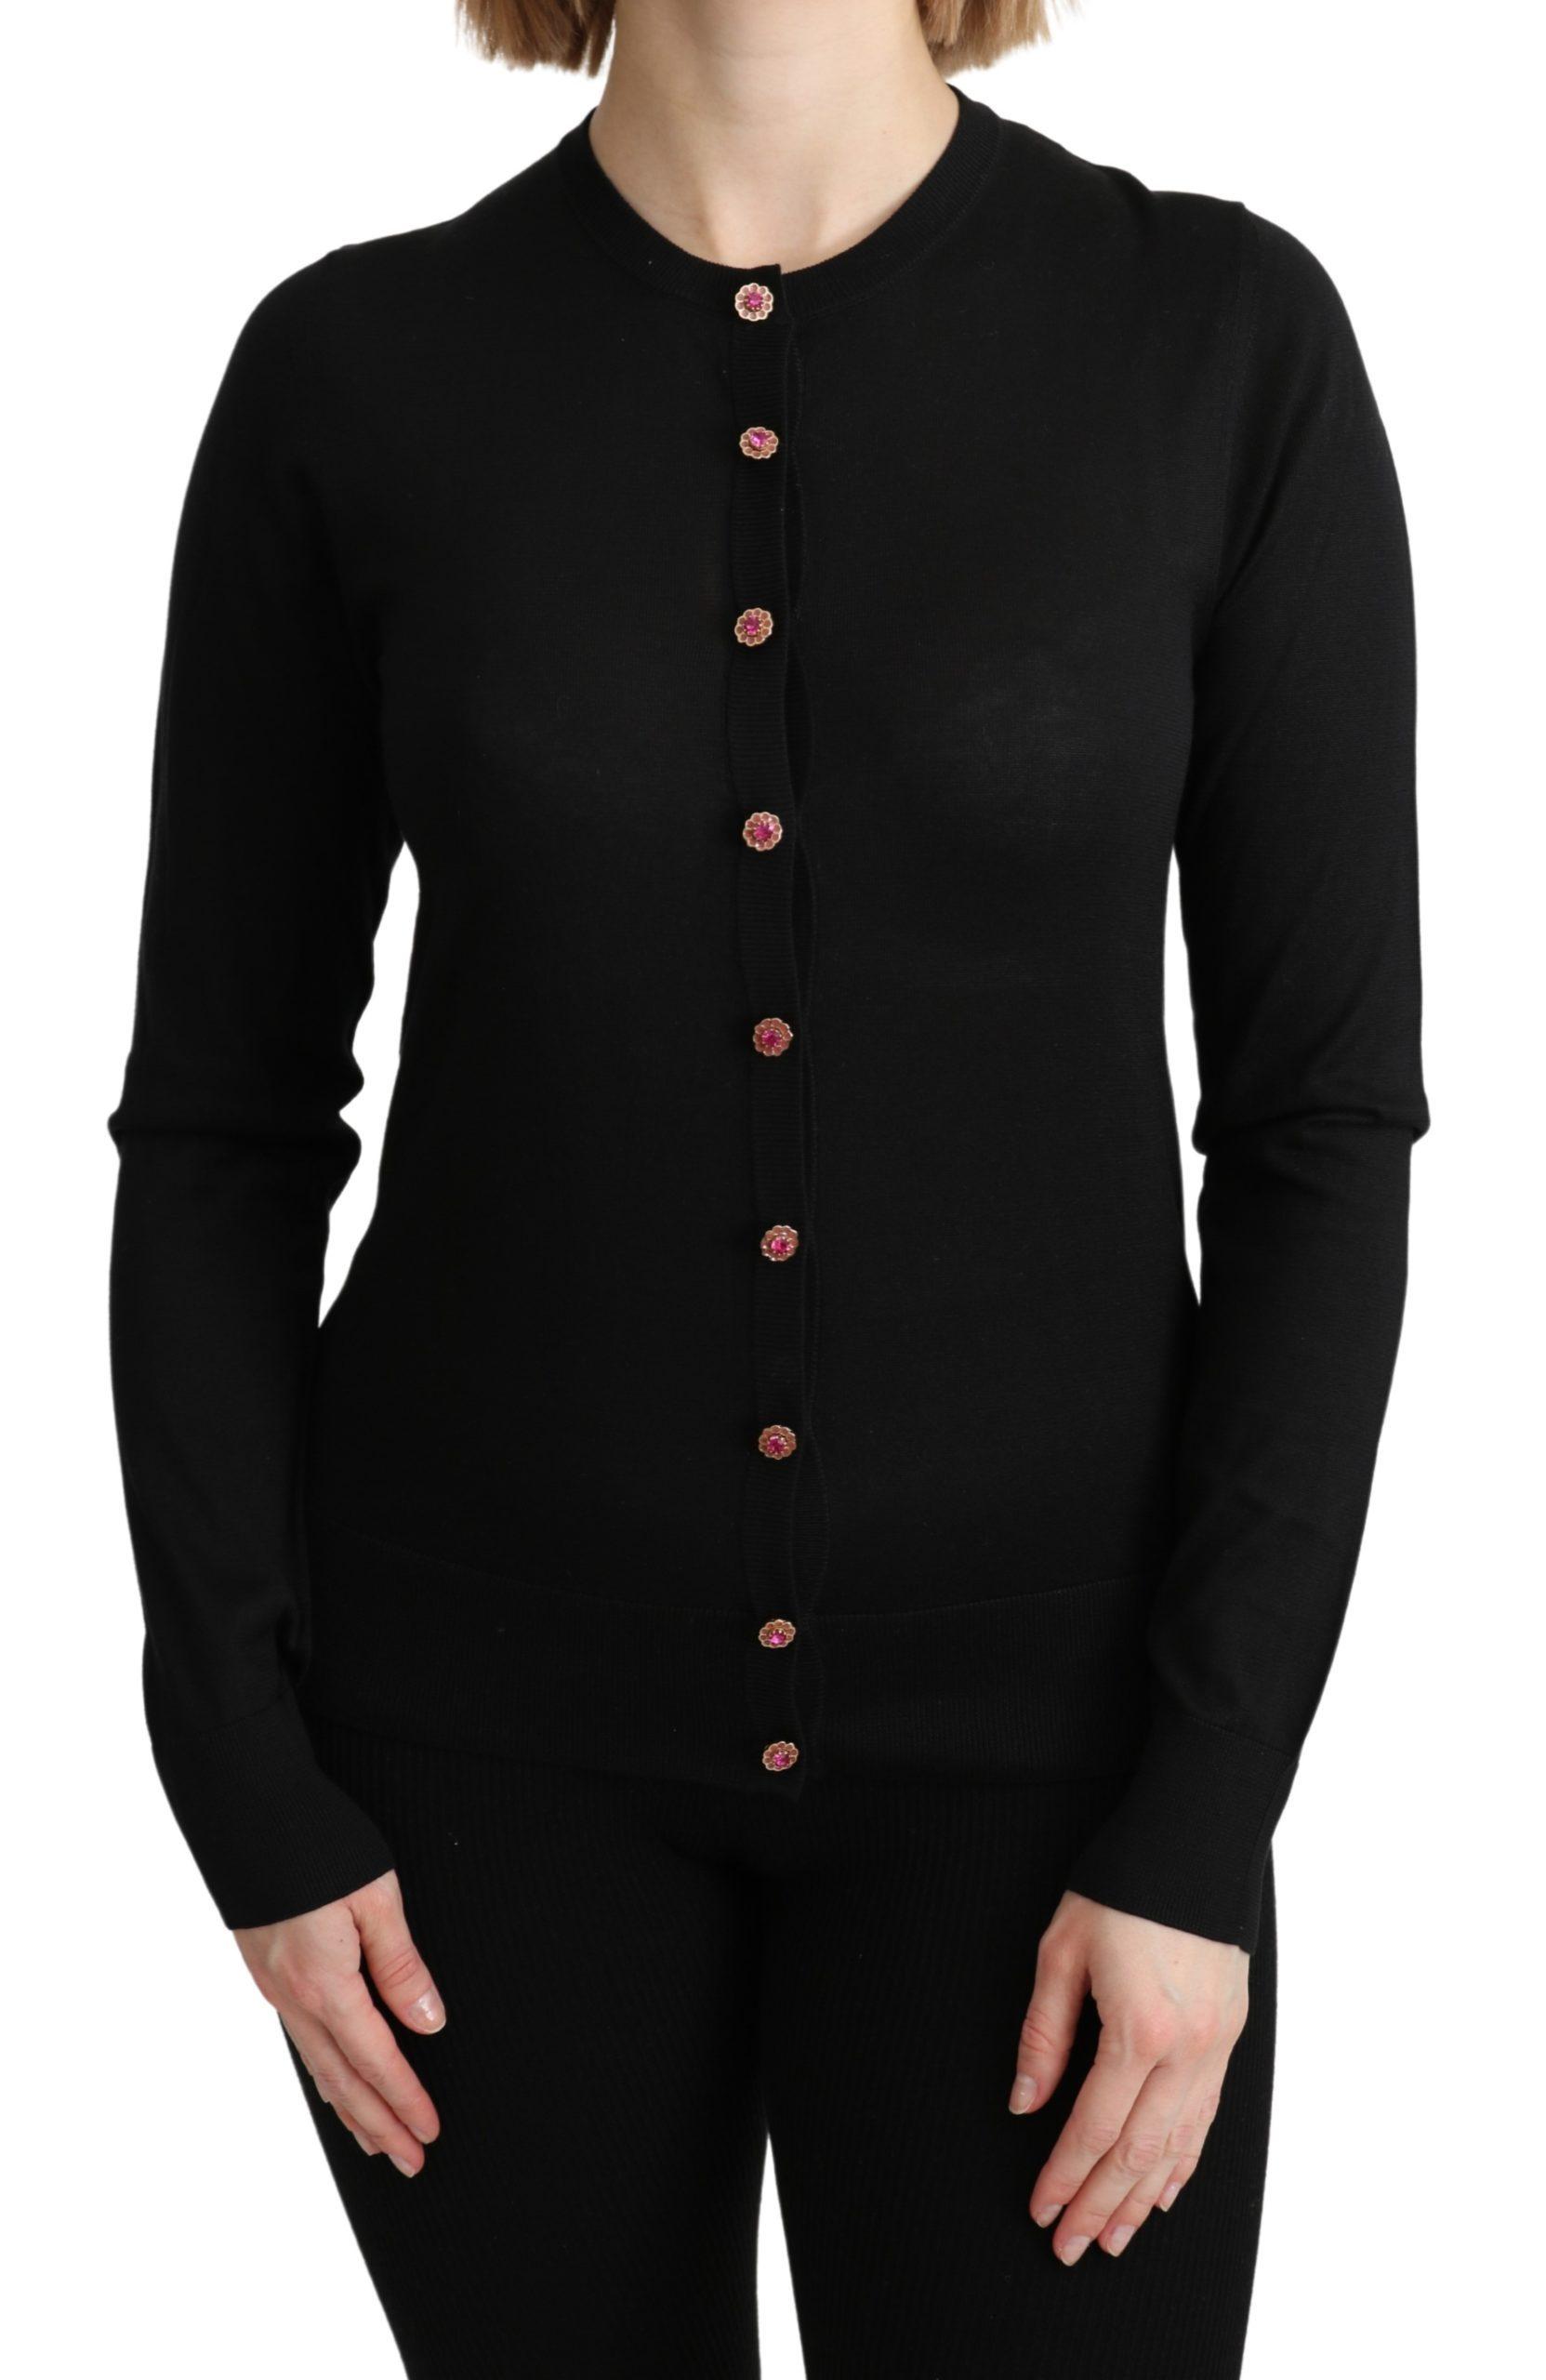 Dolce & Gabbana Women's Silk LS Cardigan Black TSH4809 - IT40|S